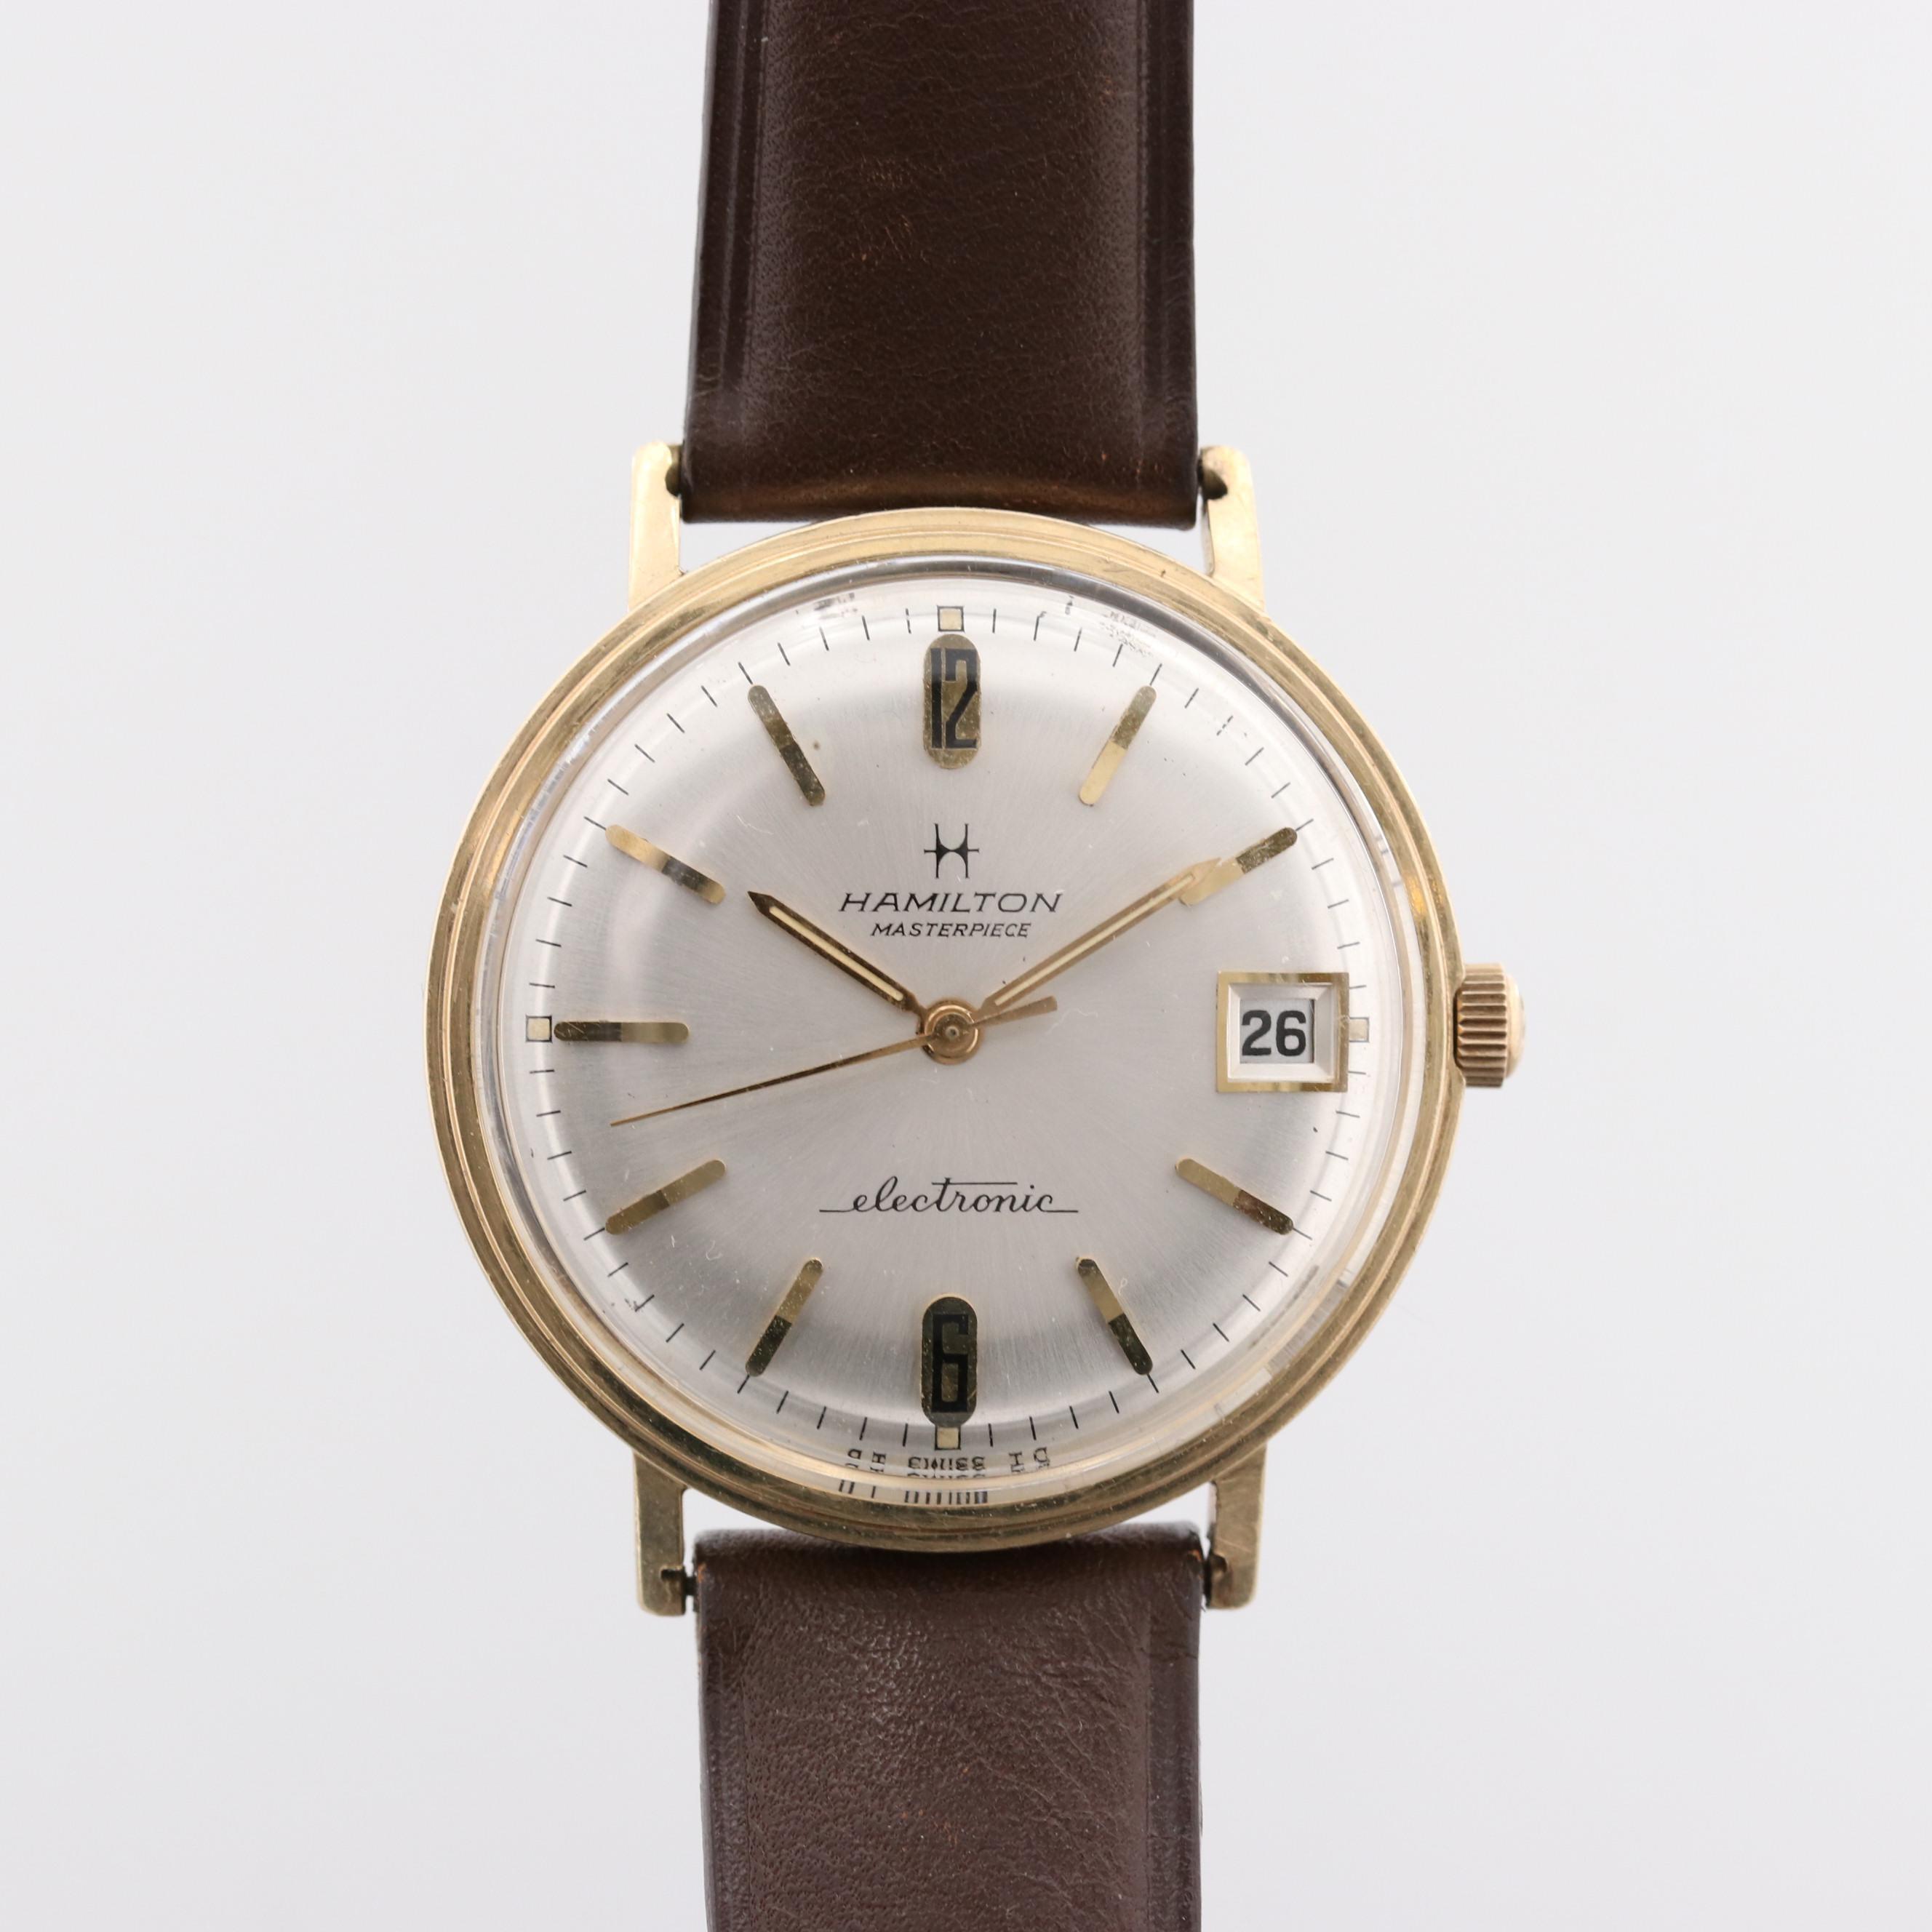 Hamilton Masterpiece 14K Yellow Gold Electronic Wristwatch With Date Window